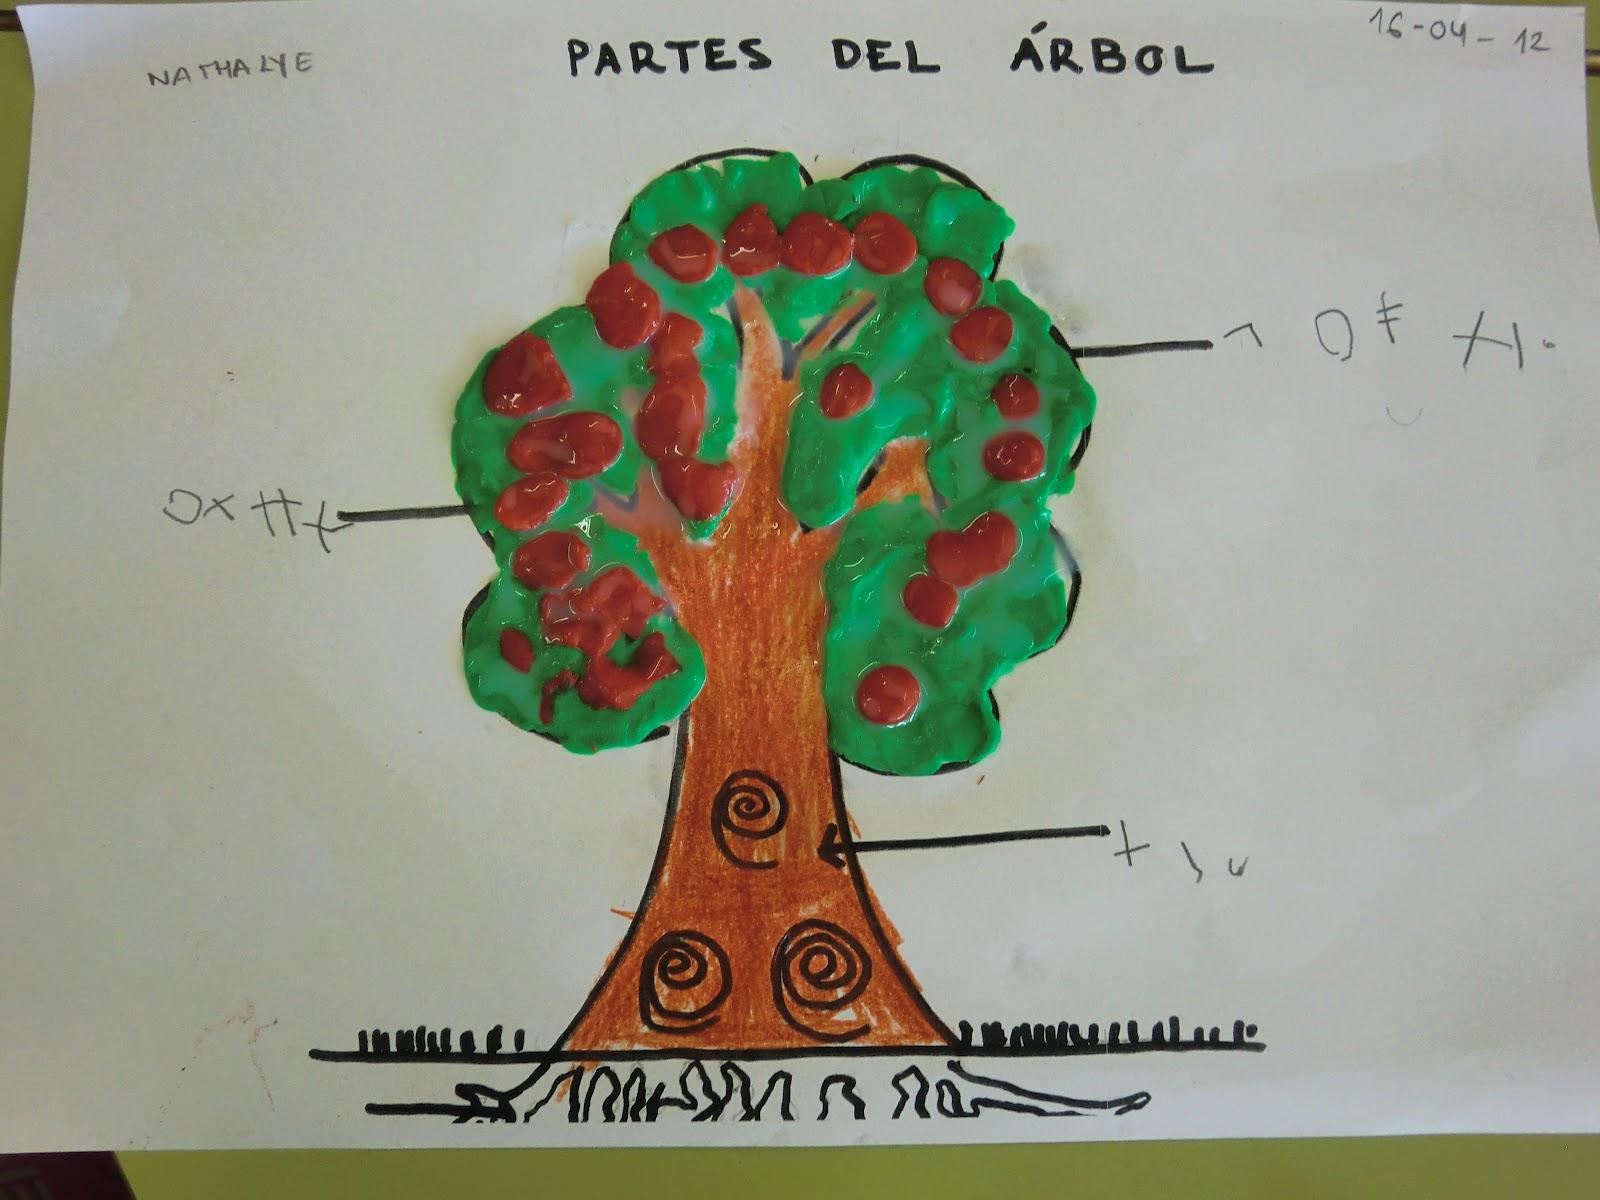 Os peques de valeixe abril 2012 for Cuales son las partes de un arbol